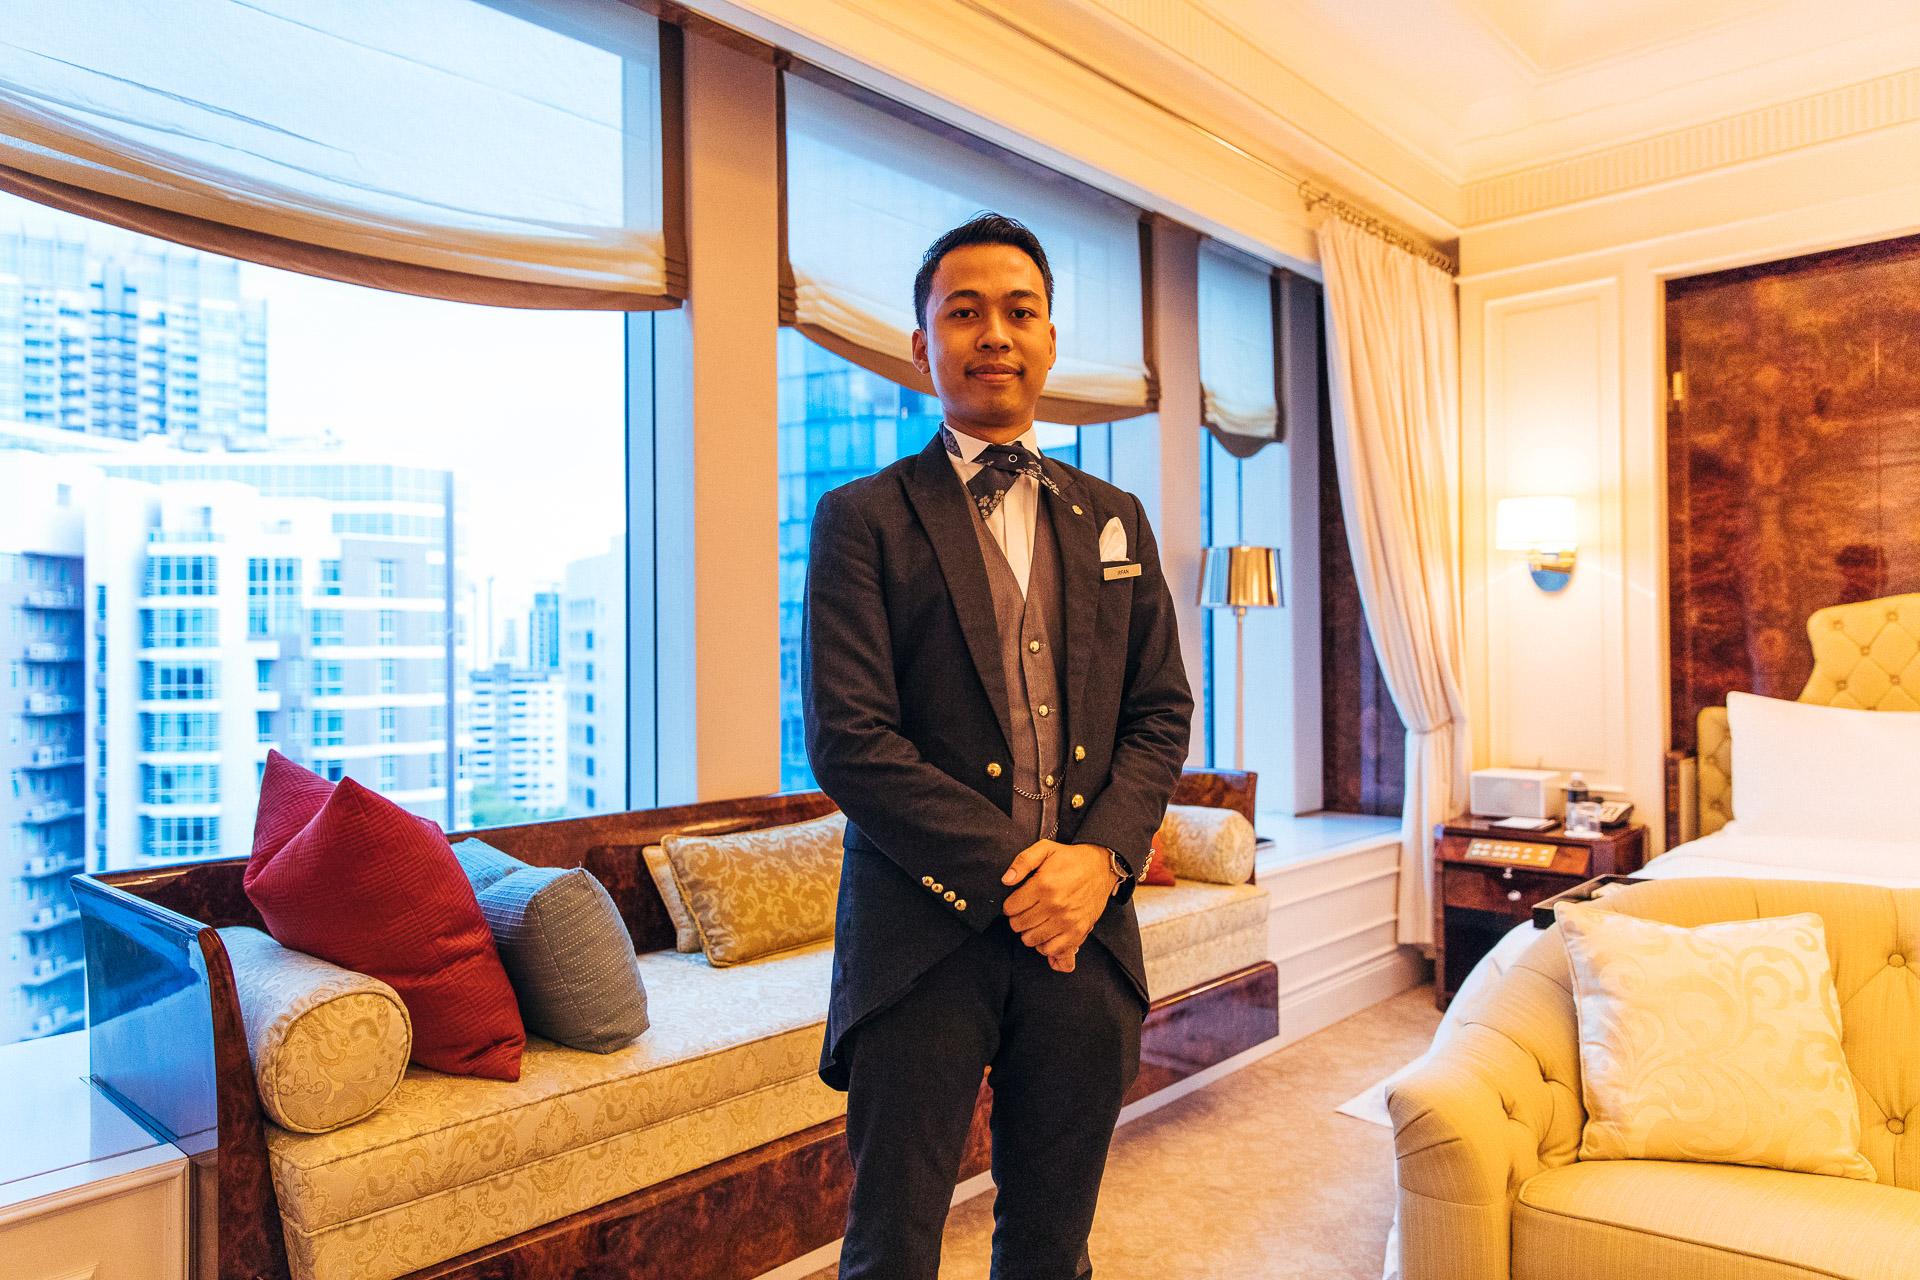 st-regis-singapore-marriott-luxury-hotel-photographer-1.jpg